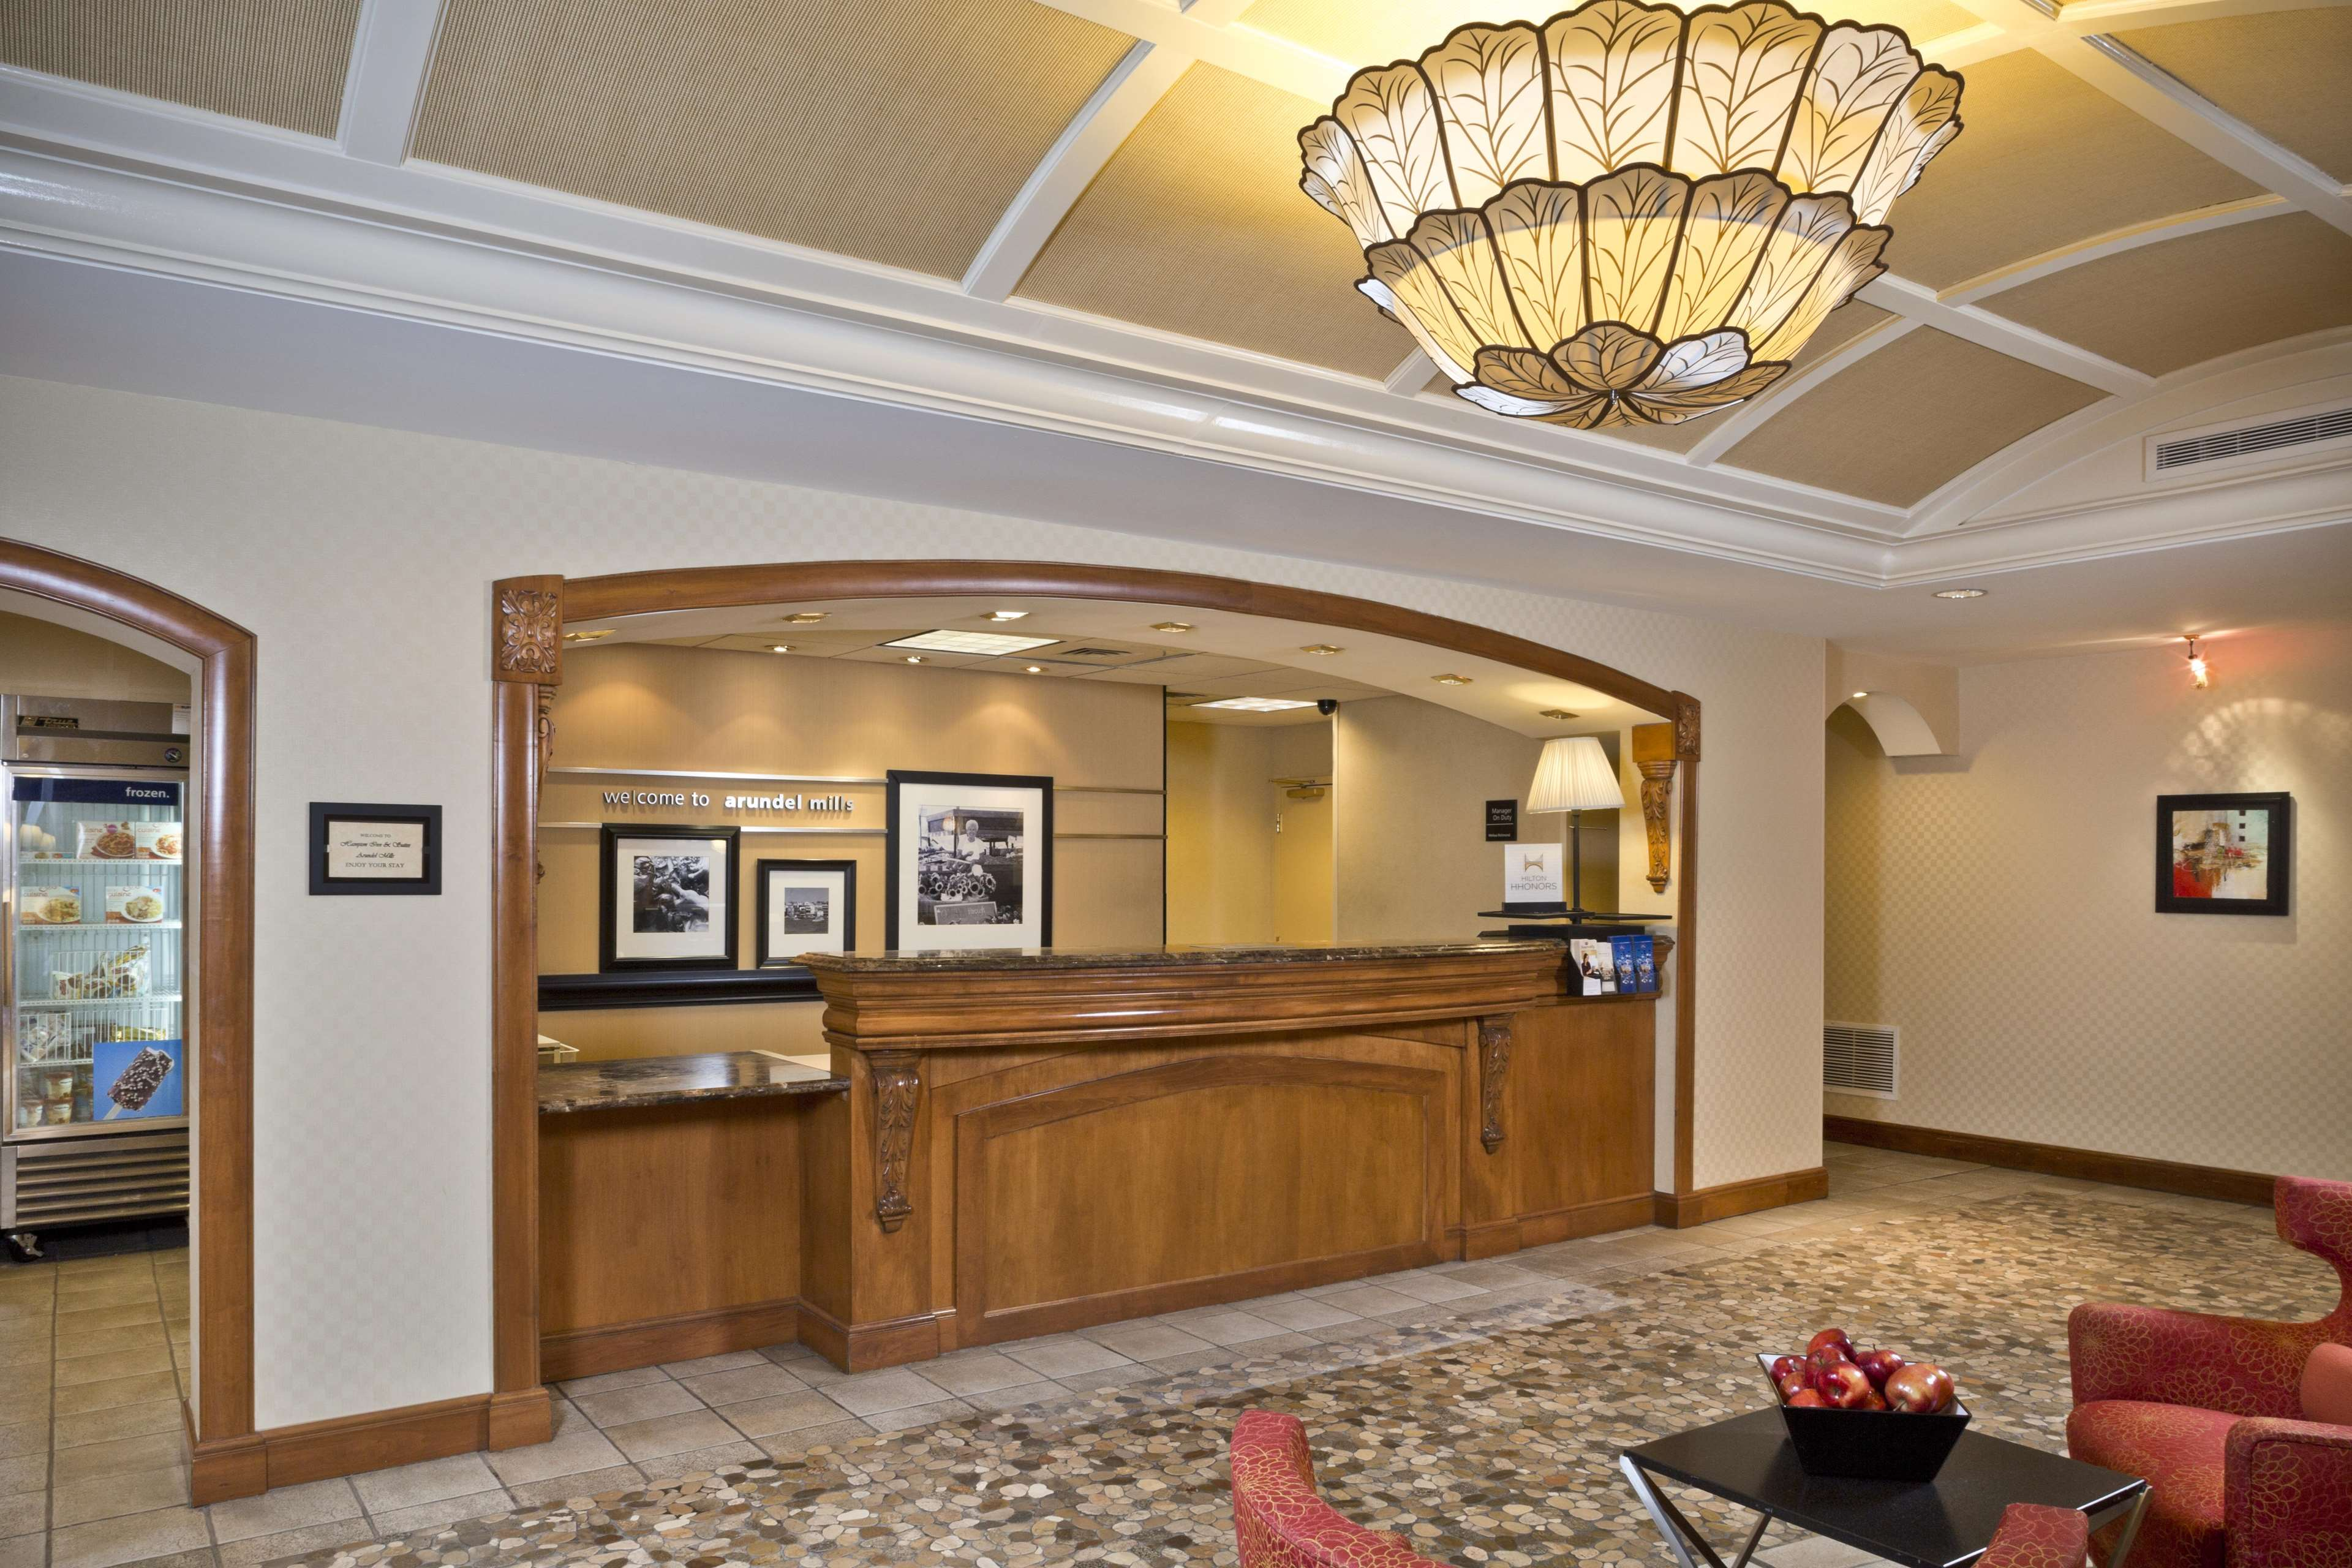 Hampton Inn & Suites Arundel Mills/Baltimore image 4